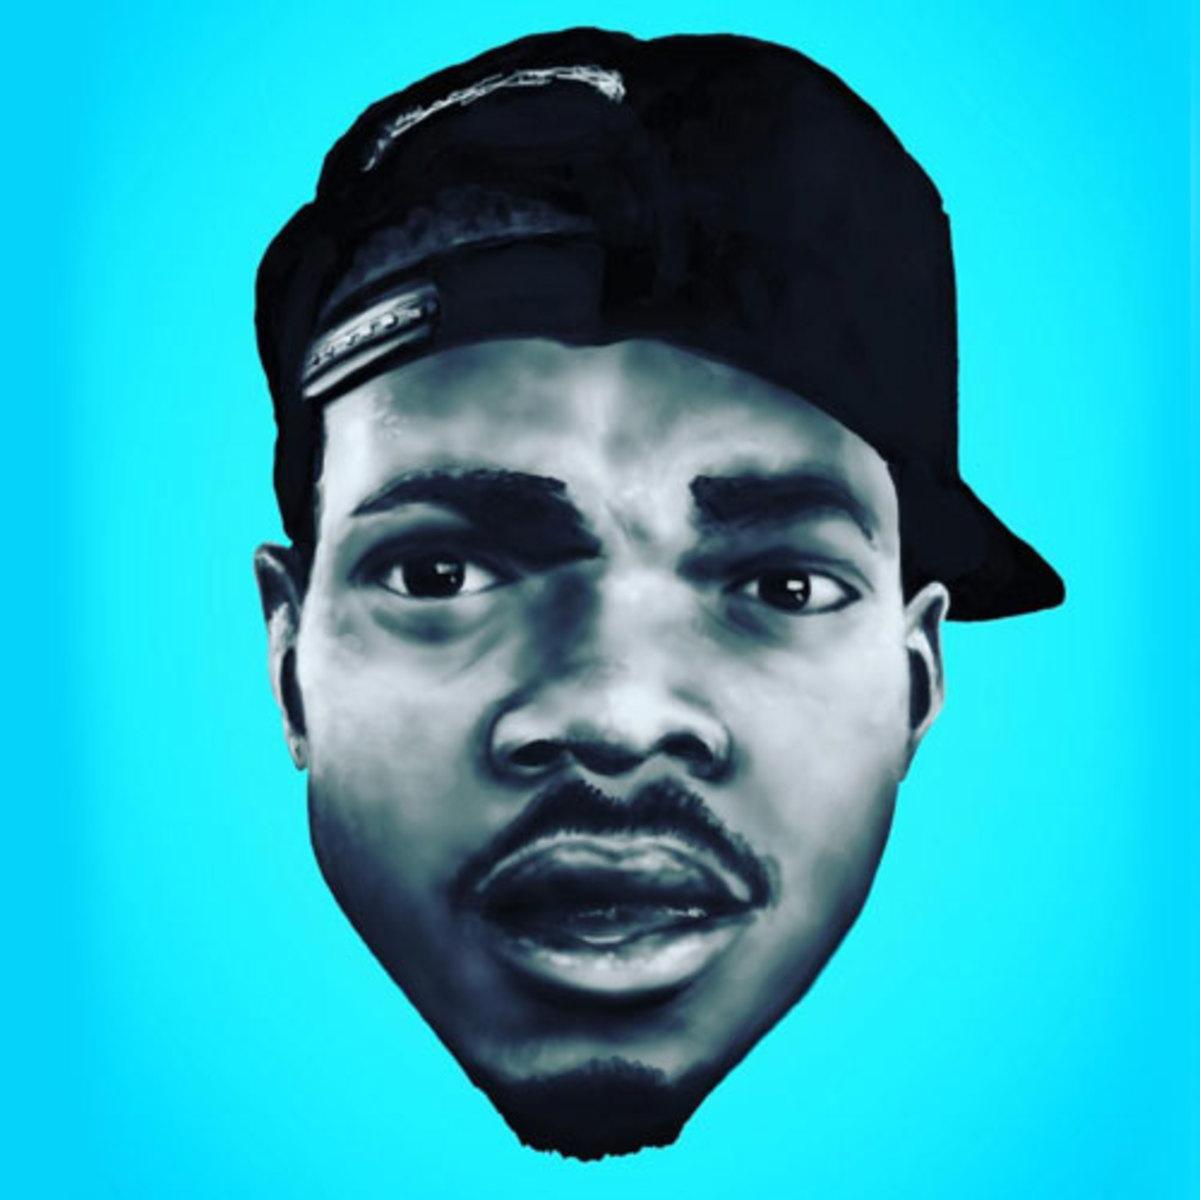 chance-the-rapper-new-album-announcement.jpg